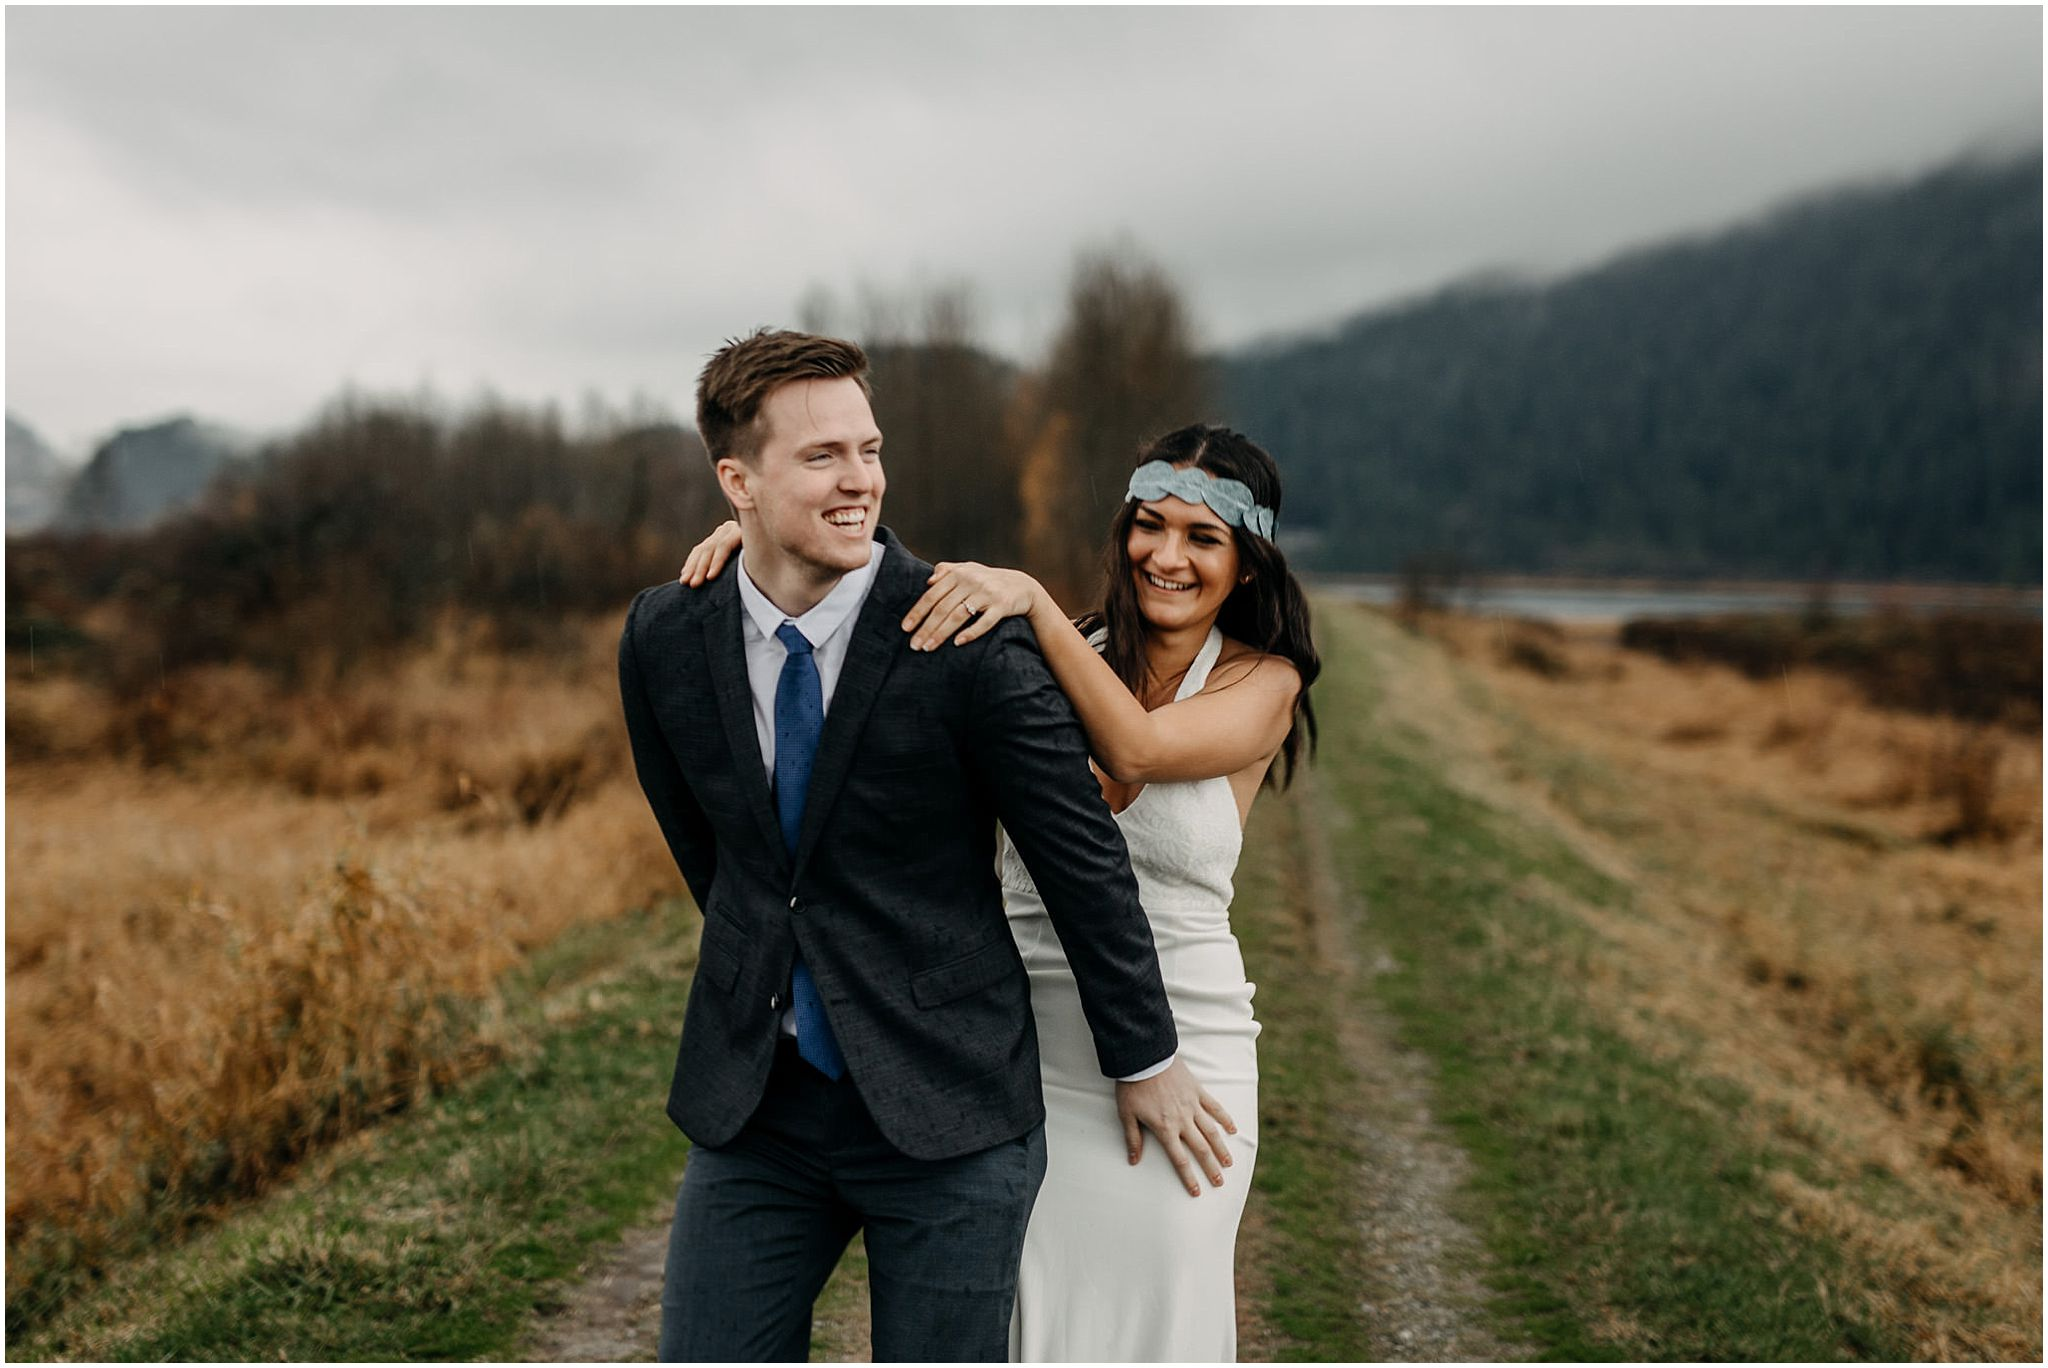 girl fall piggyback couple candid moment pitt lake engagement